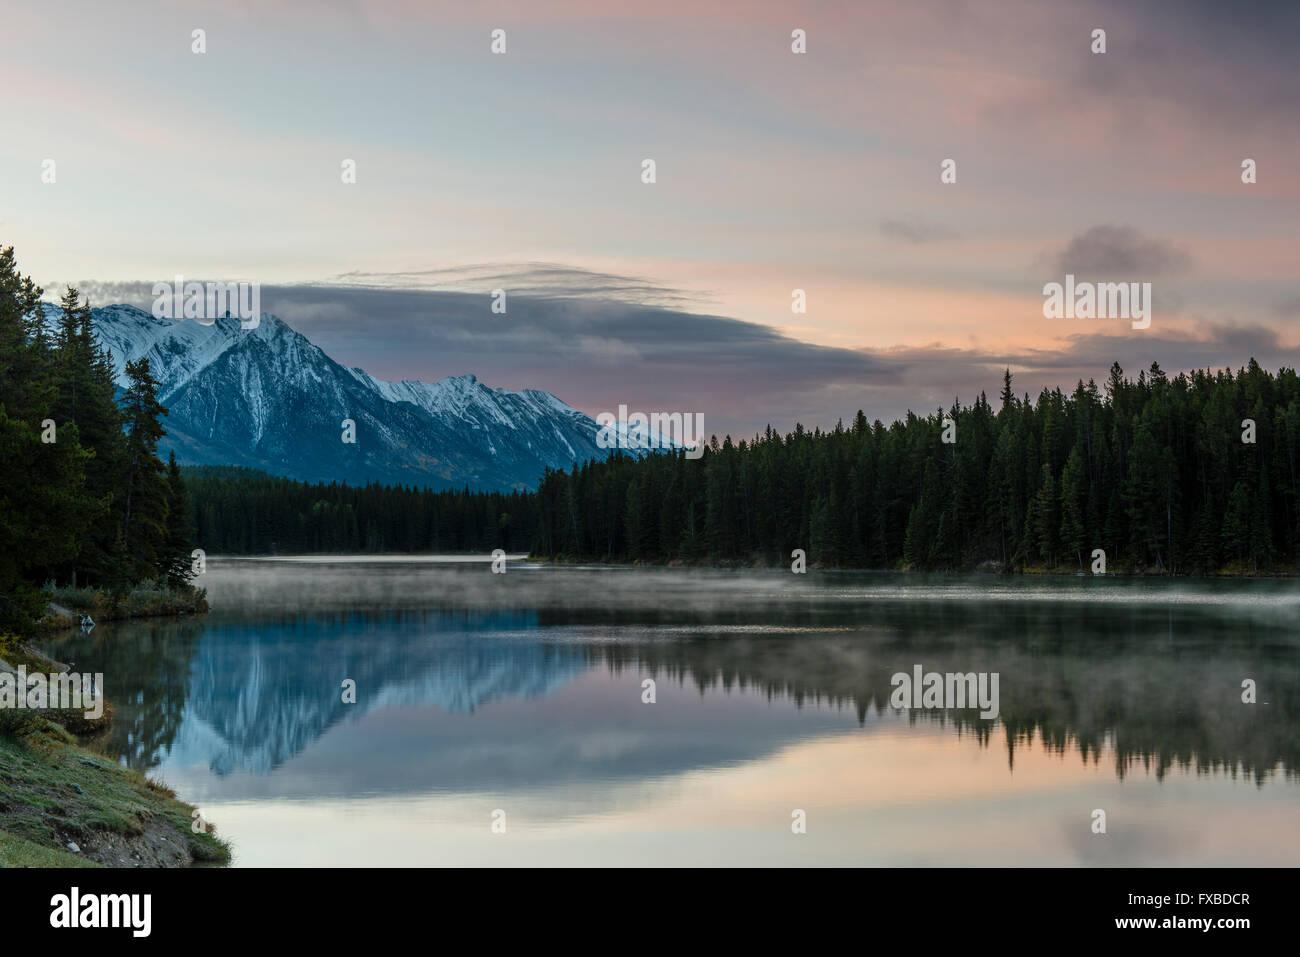 Johnson Lake, Banff Nationalpark, Kanadische Rockies, Provinz Alberta, Kanada Stockbild